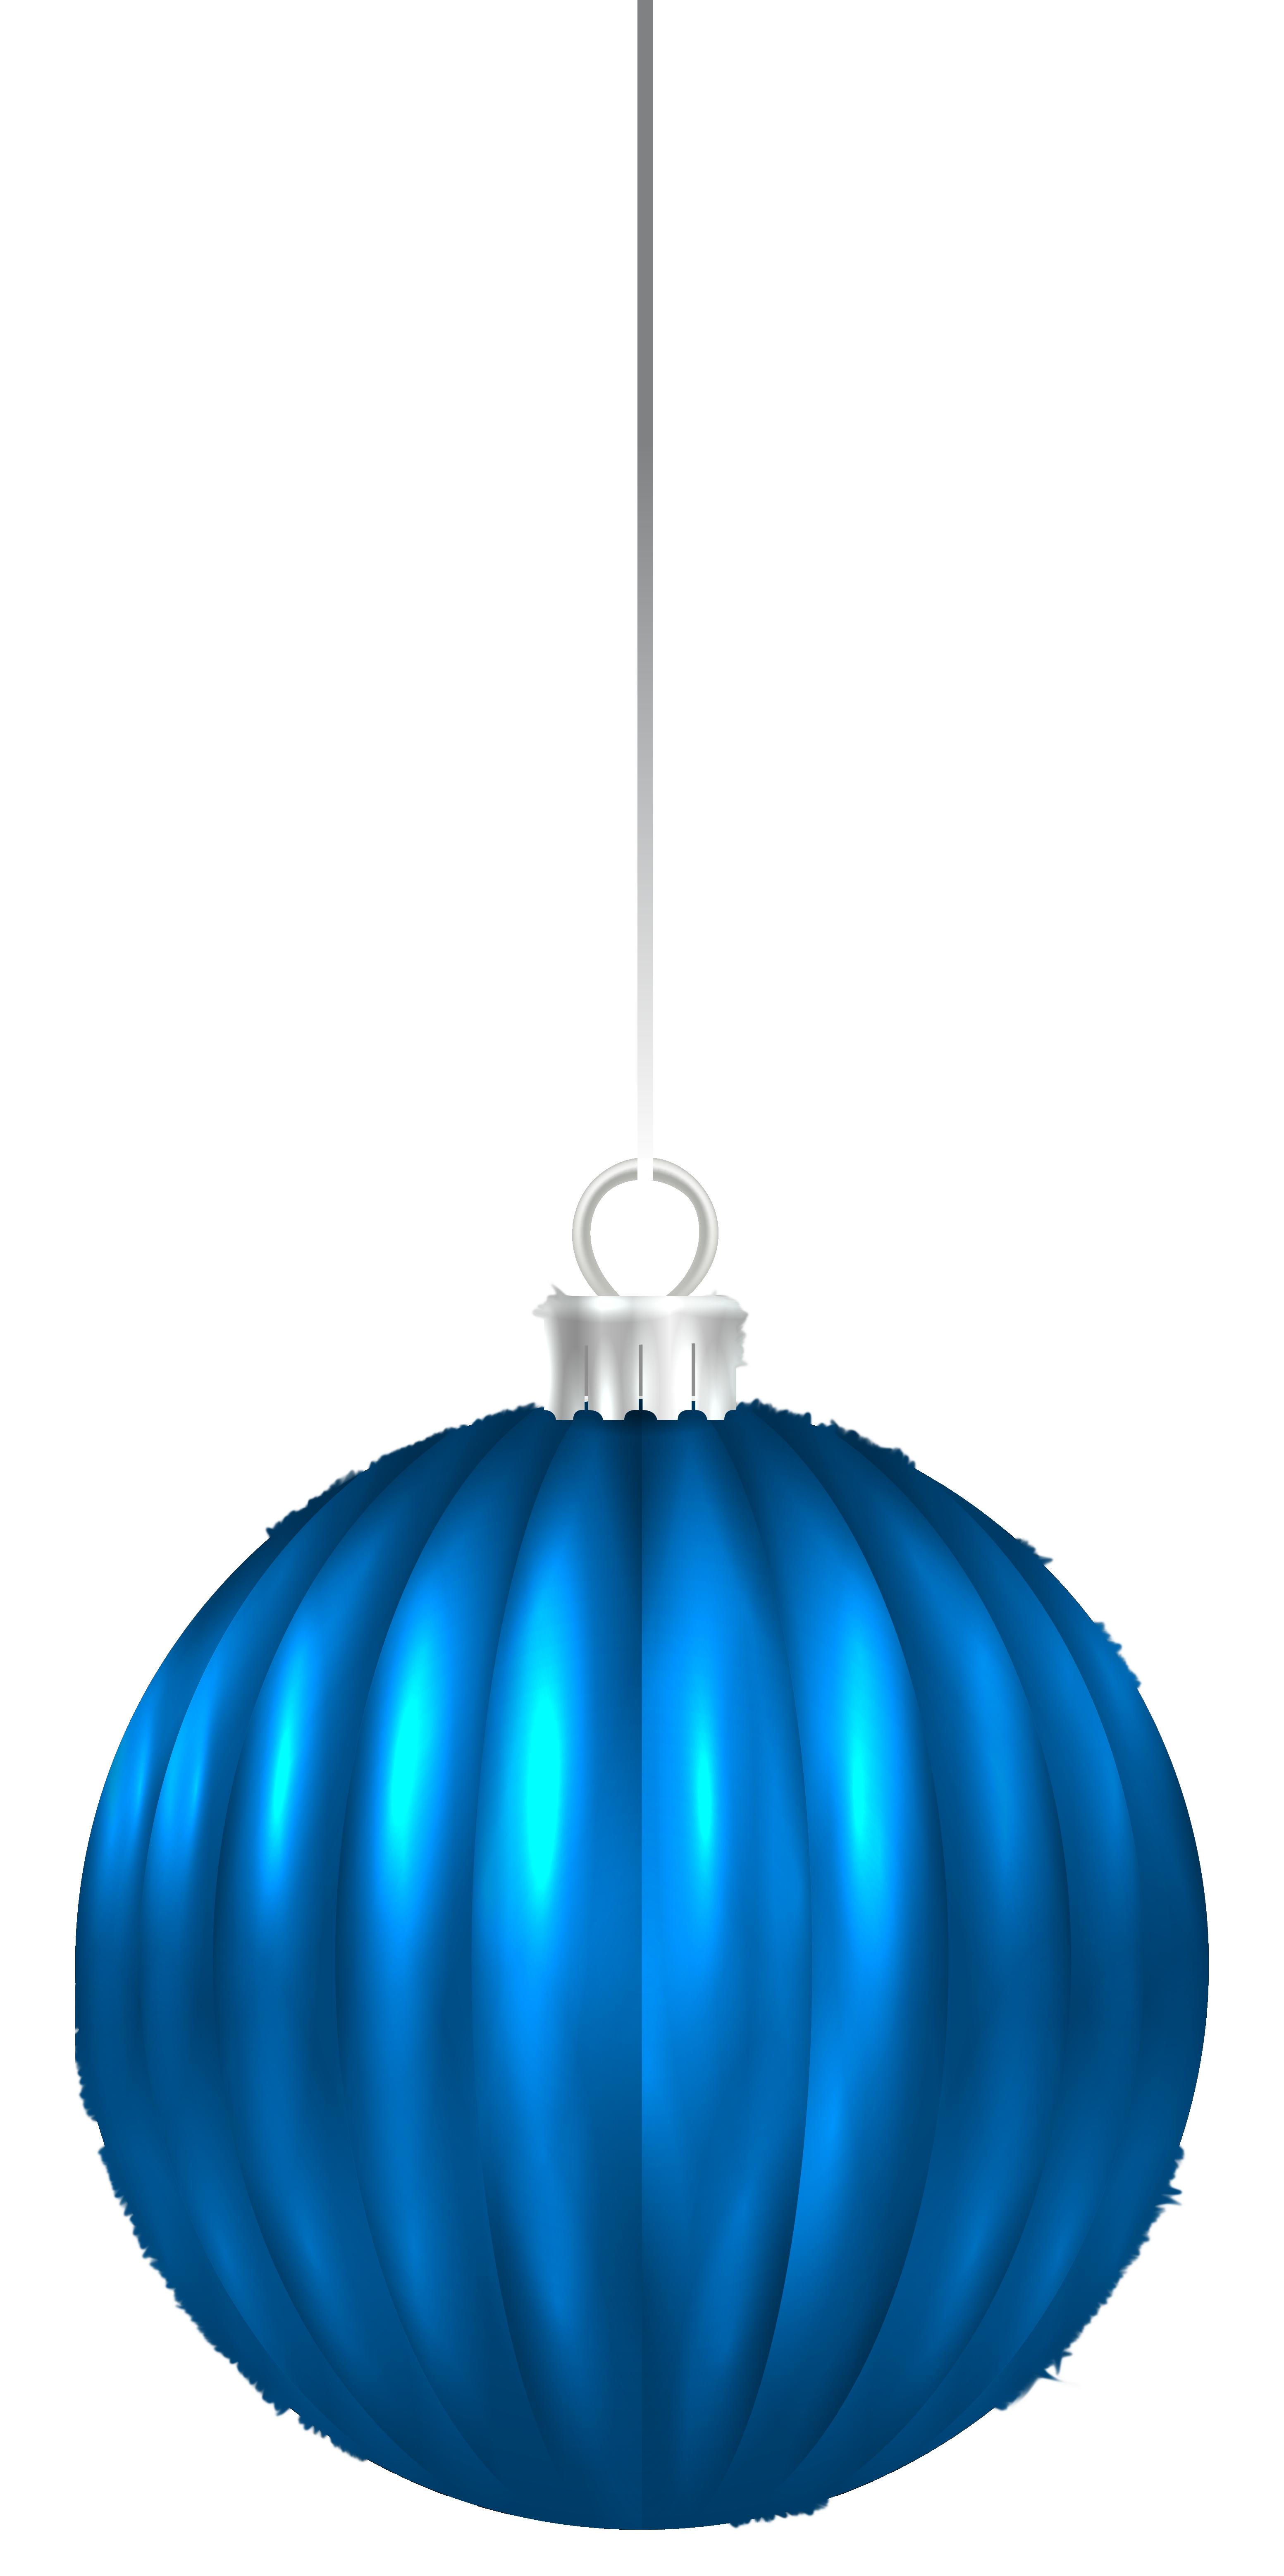 3106x6230 Blue Christmas Ball Ornament Png Clip Art Imageu200b Gallery